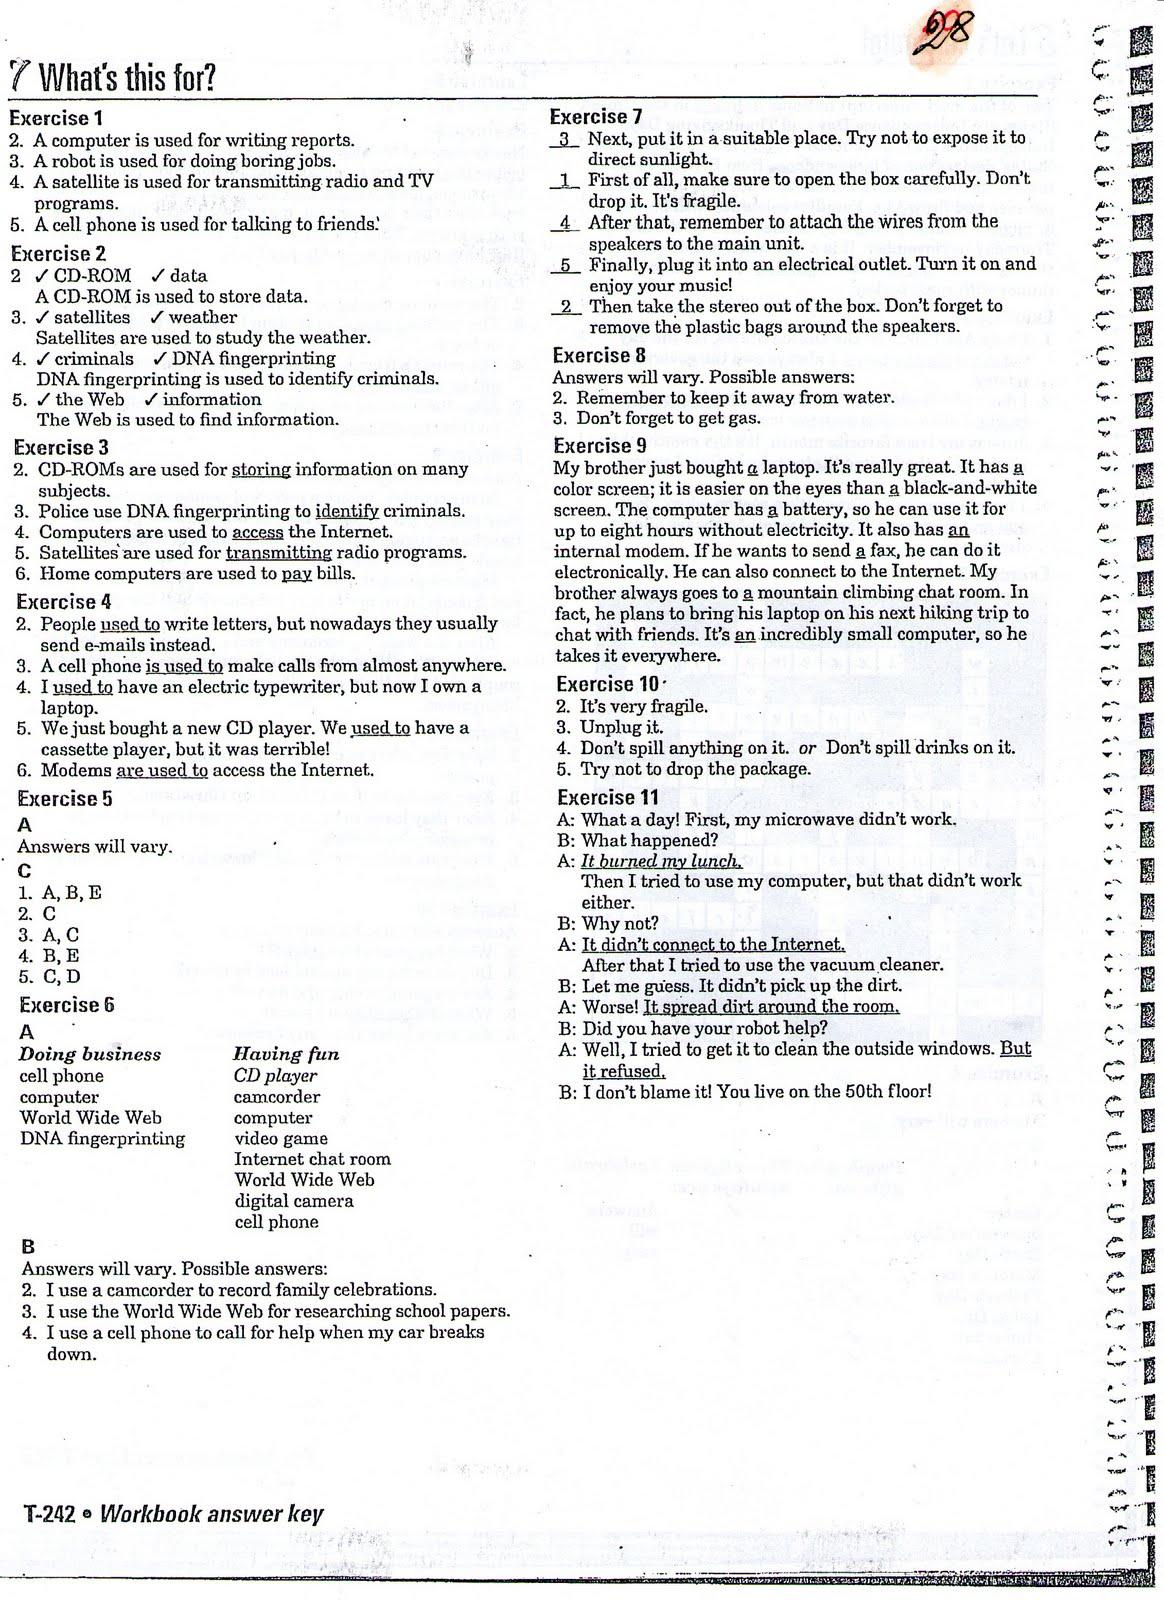 Workbooks answers to spanish 2 workbook : Interchange 2 (English Textbook): agosto 2010